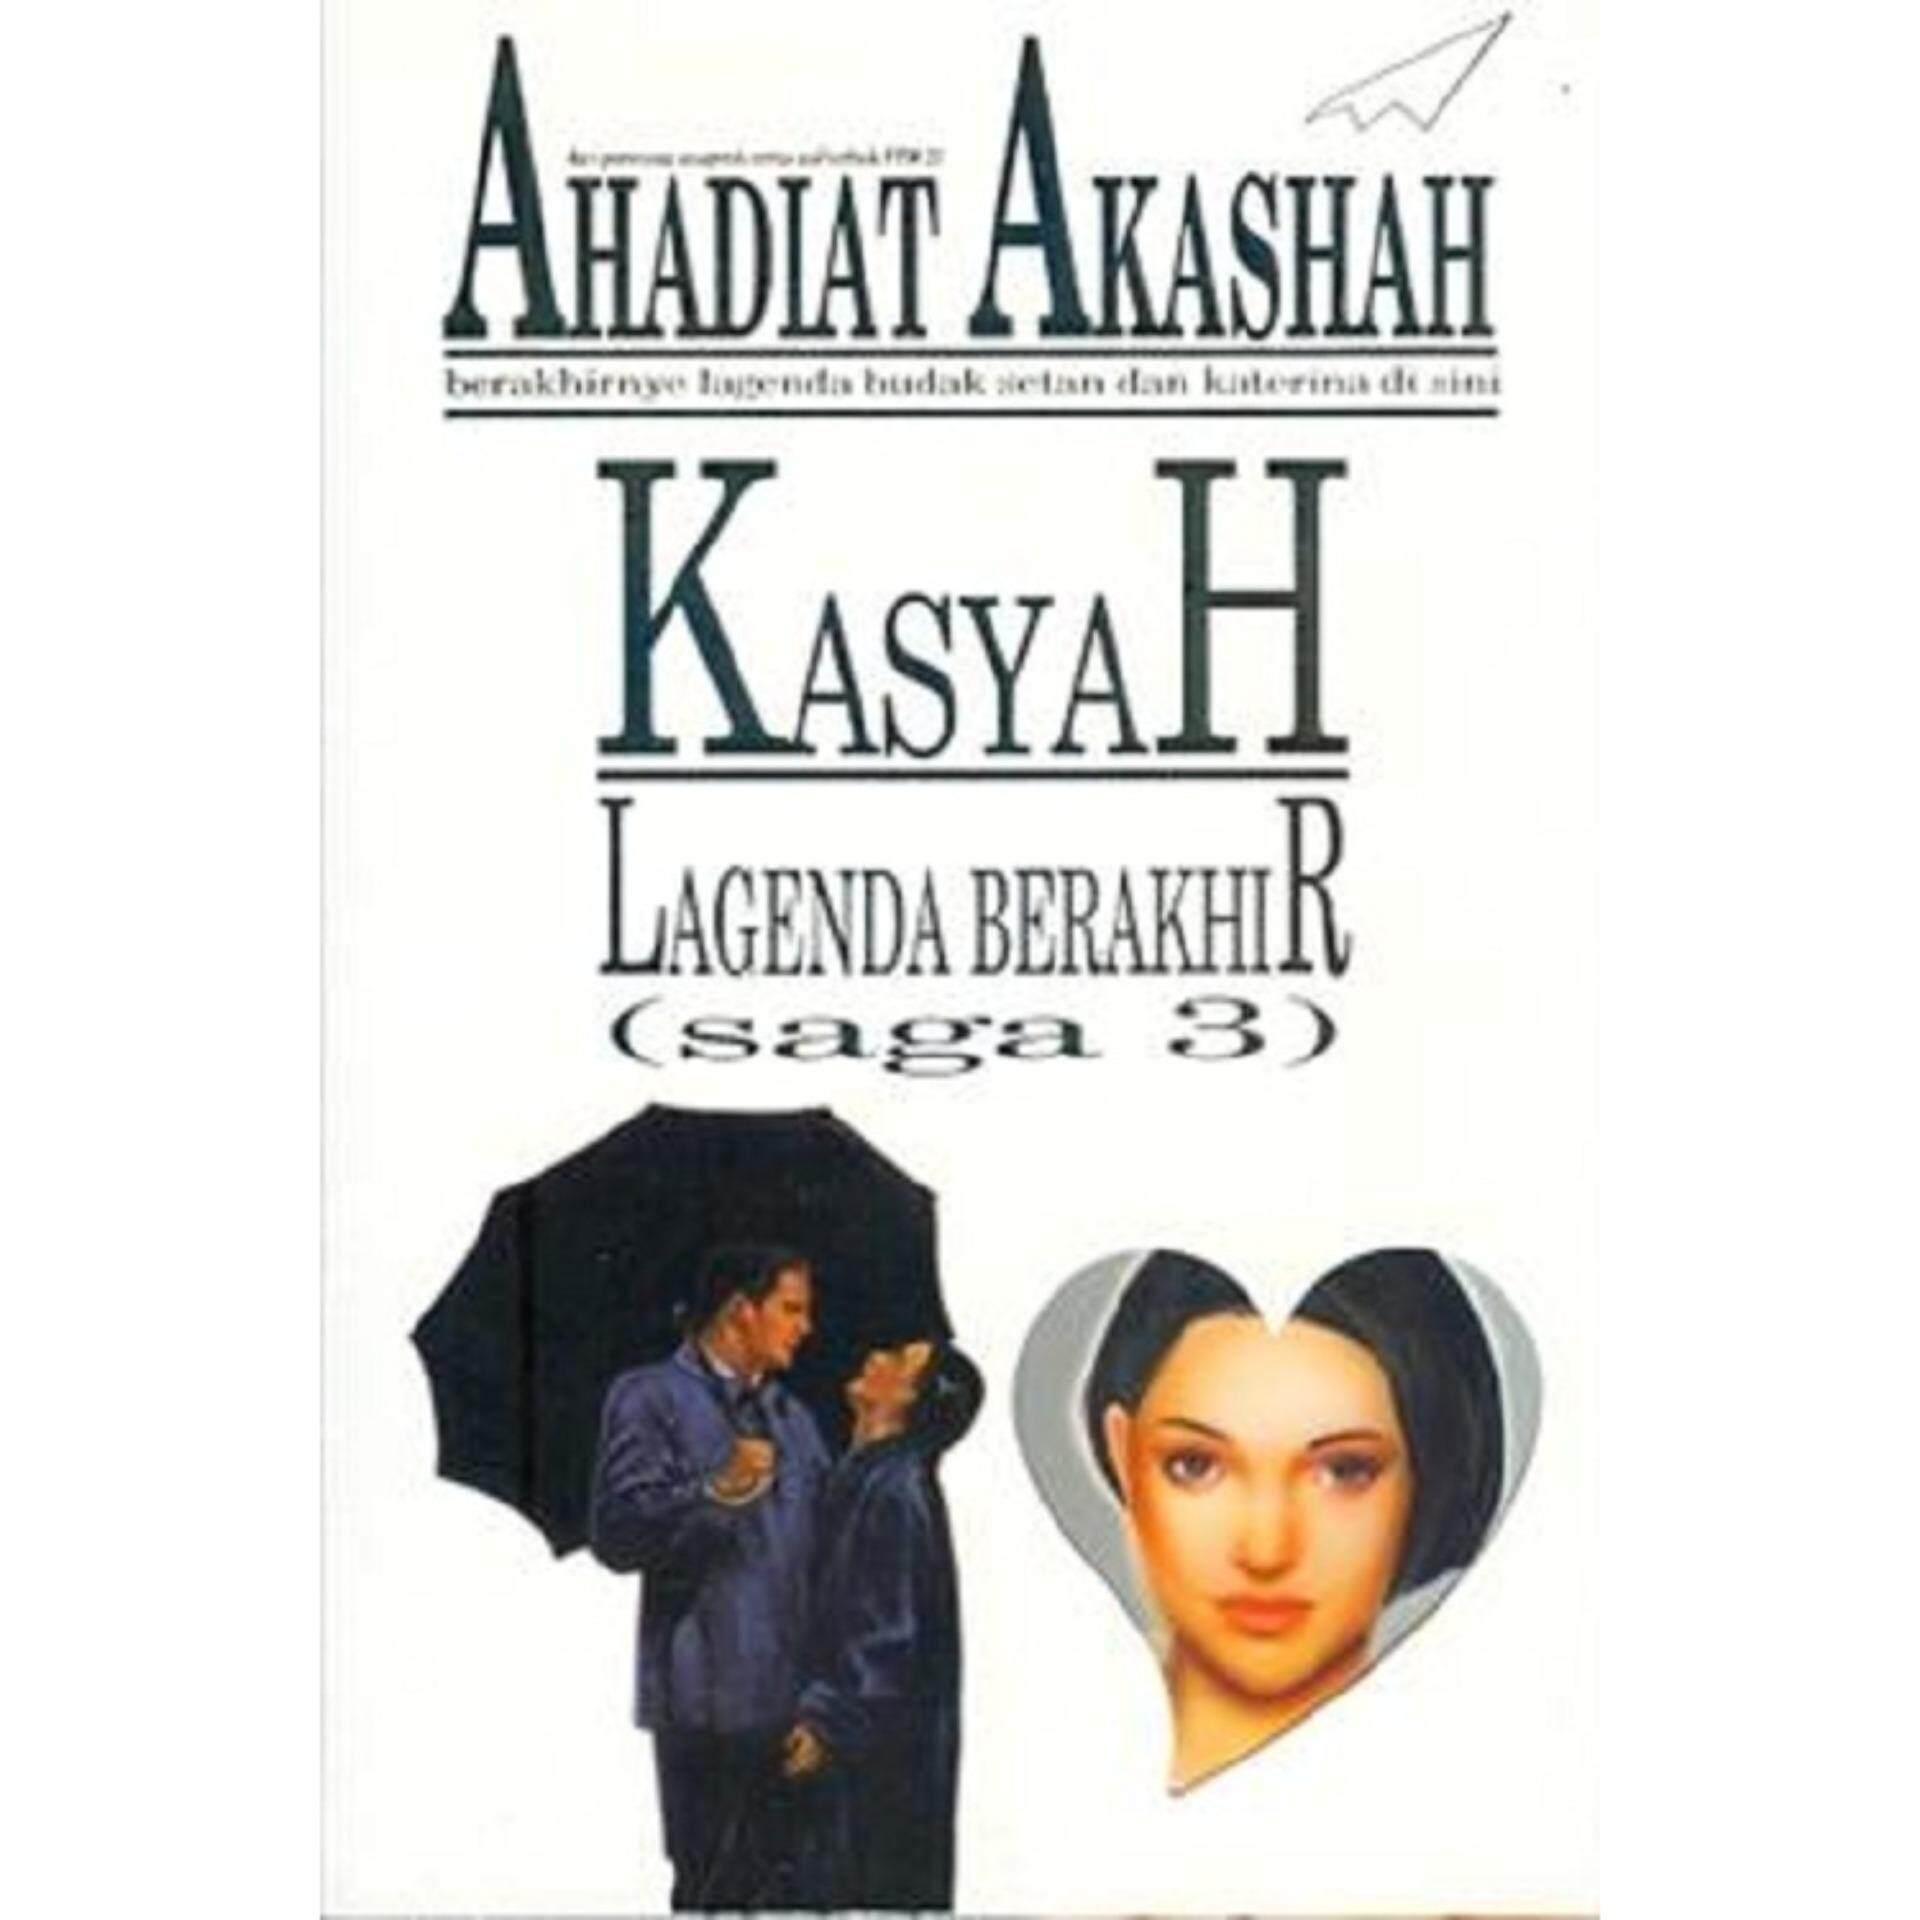 Kasyah: Lagenda Berakhir (Saga #3) - ISBN : 9789833642182 Author Ahadiat Akashah